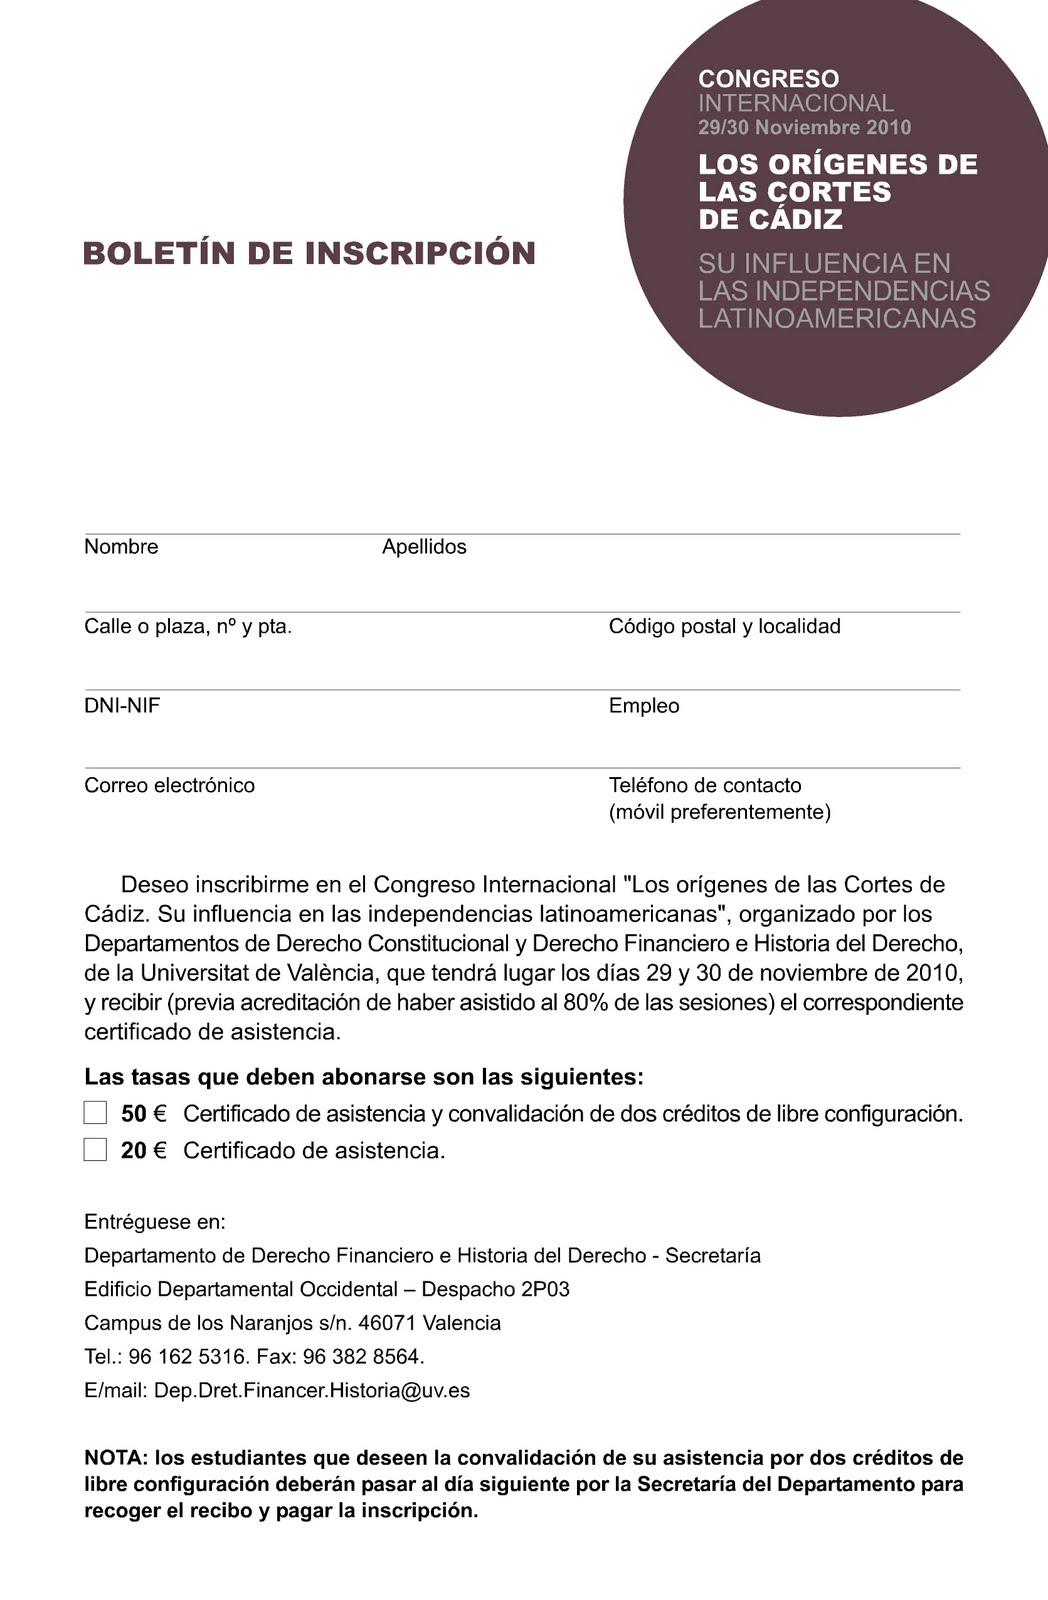 http://3.bp.blogspot.com/_NlGWvrksxYM/TOt-lonr4UI/AAAAAAAAAWI/Nv9qUdPeyzo/s1600/Boletin_inscripcion_Congreso_Cortes_Cadiz.jpg